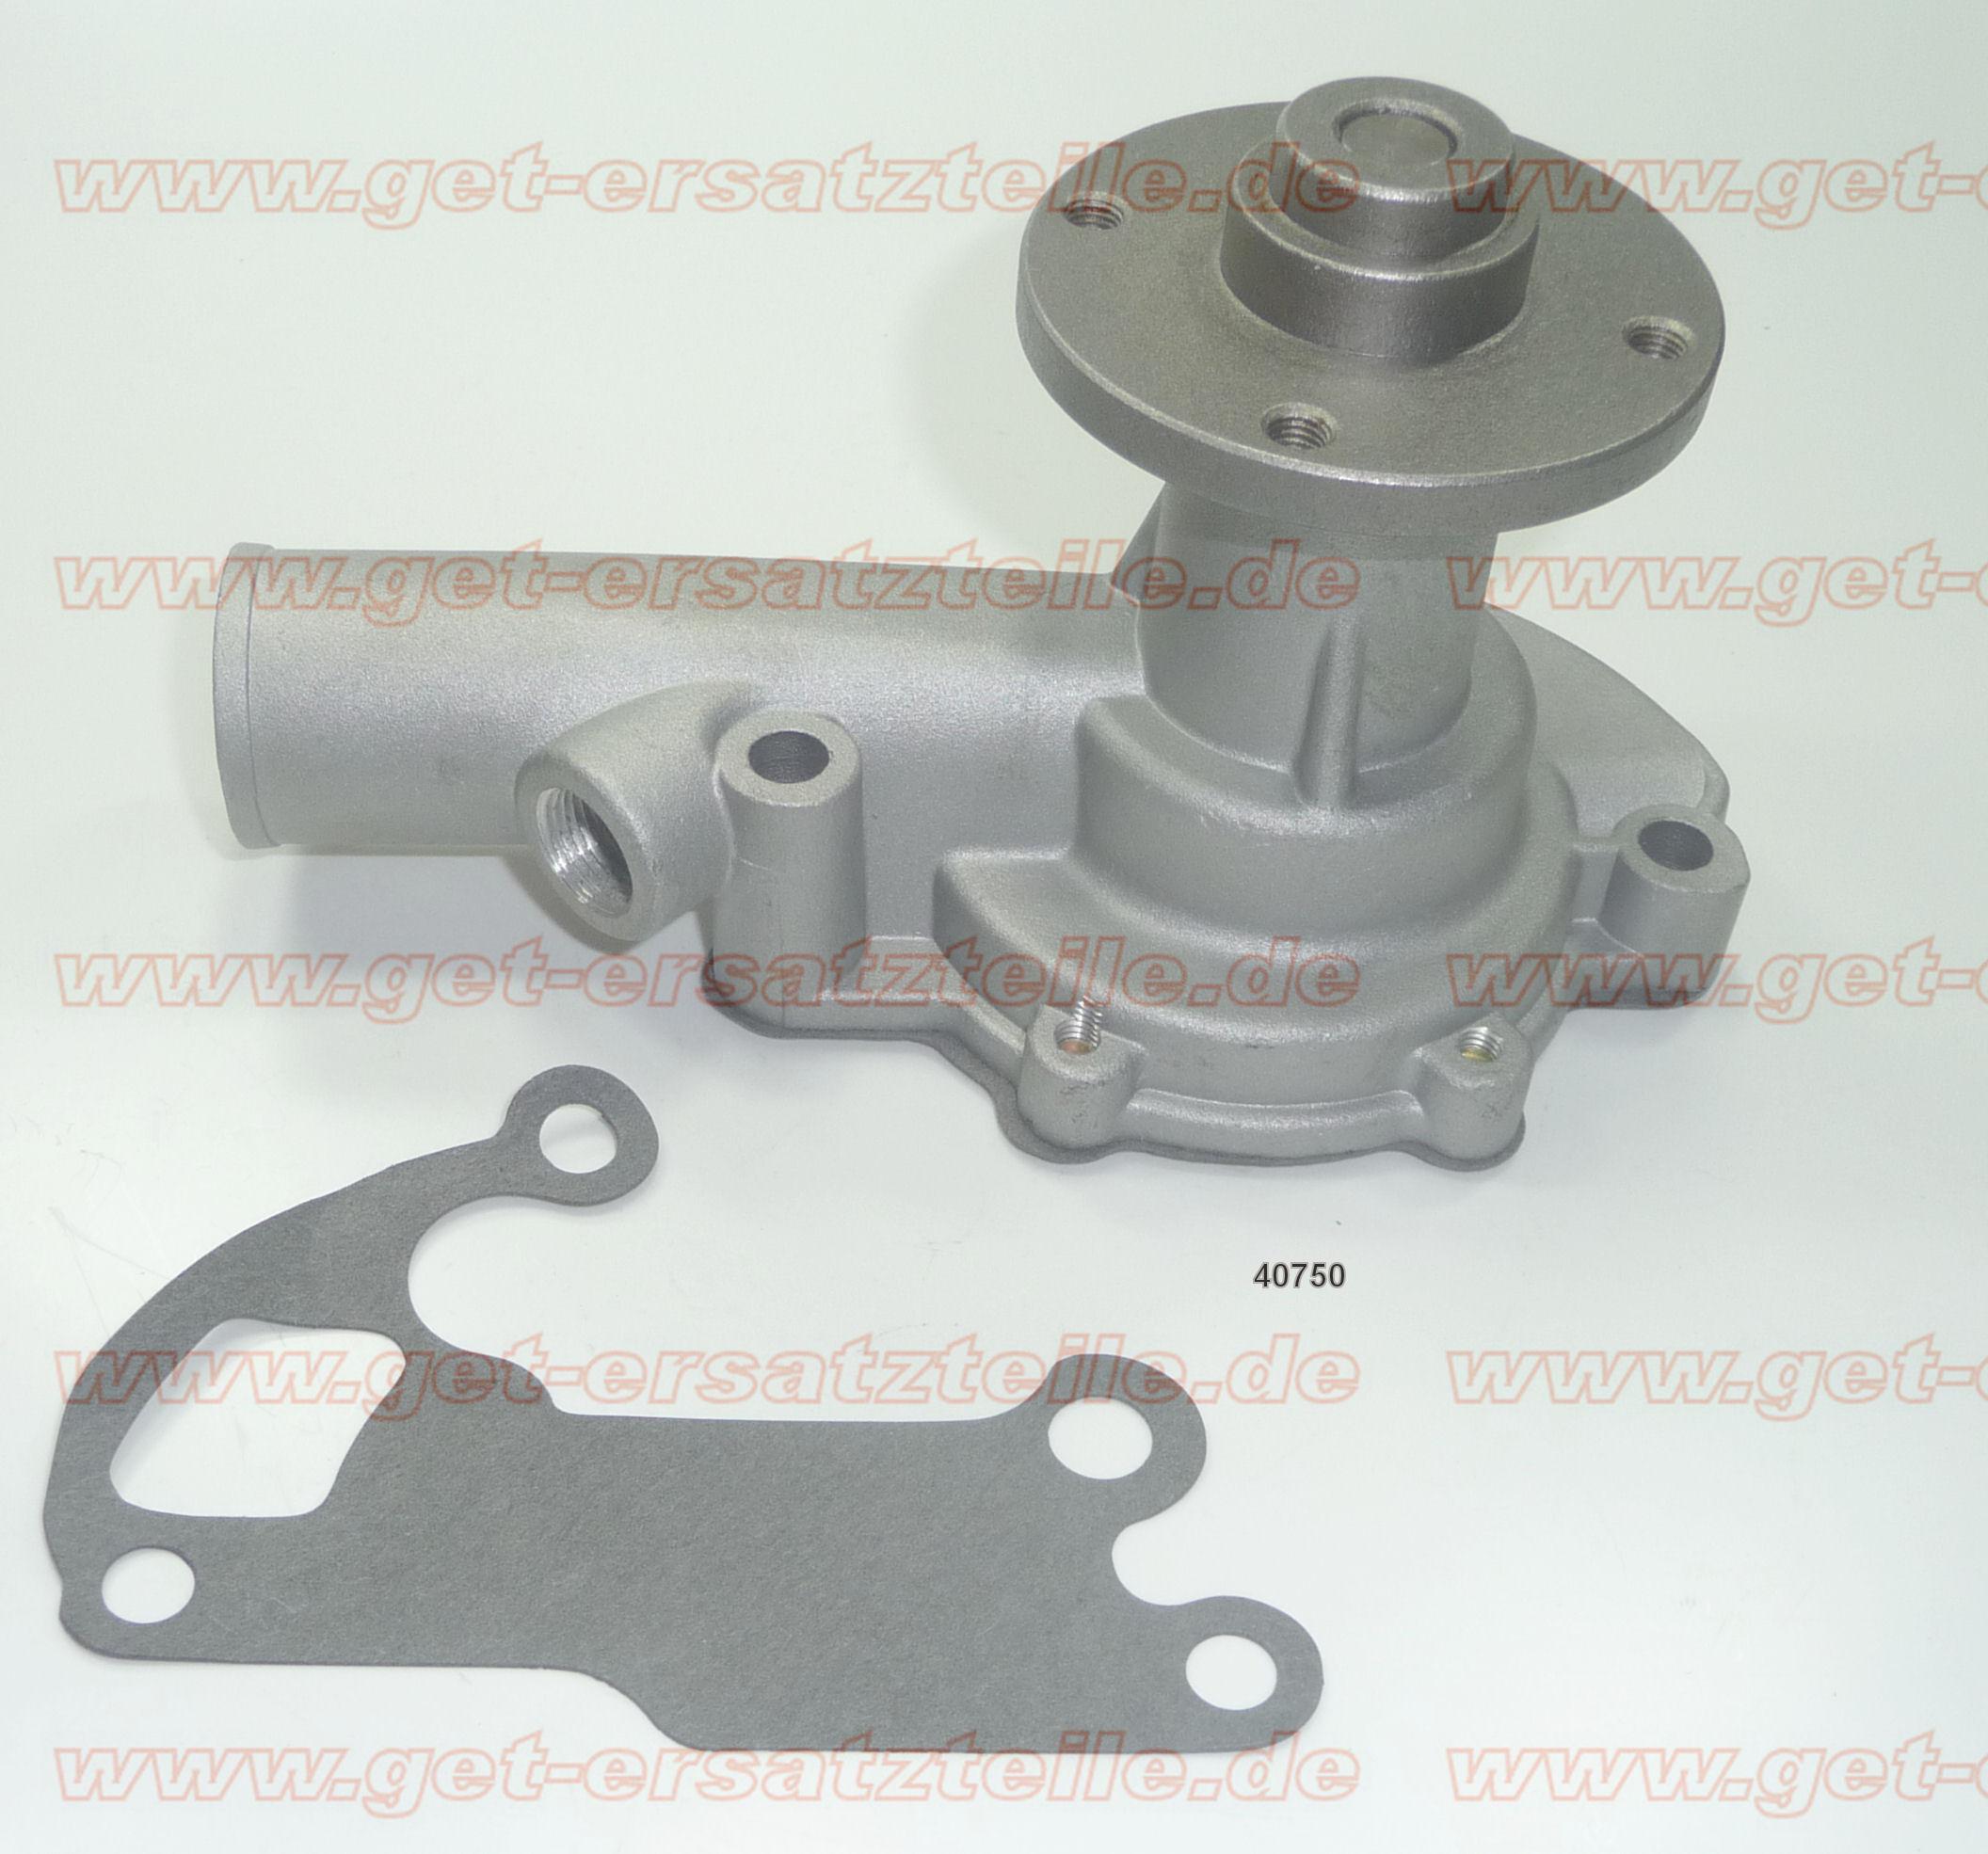 Staplerteile, Anbaugeräte, Kraftstoffleitung, Lenkachse, Spurstange, Lenkzylinder